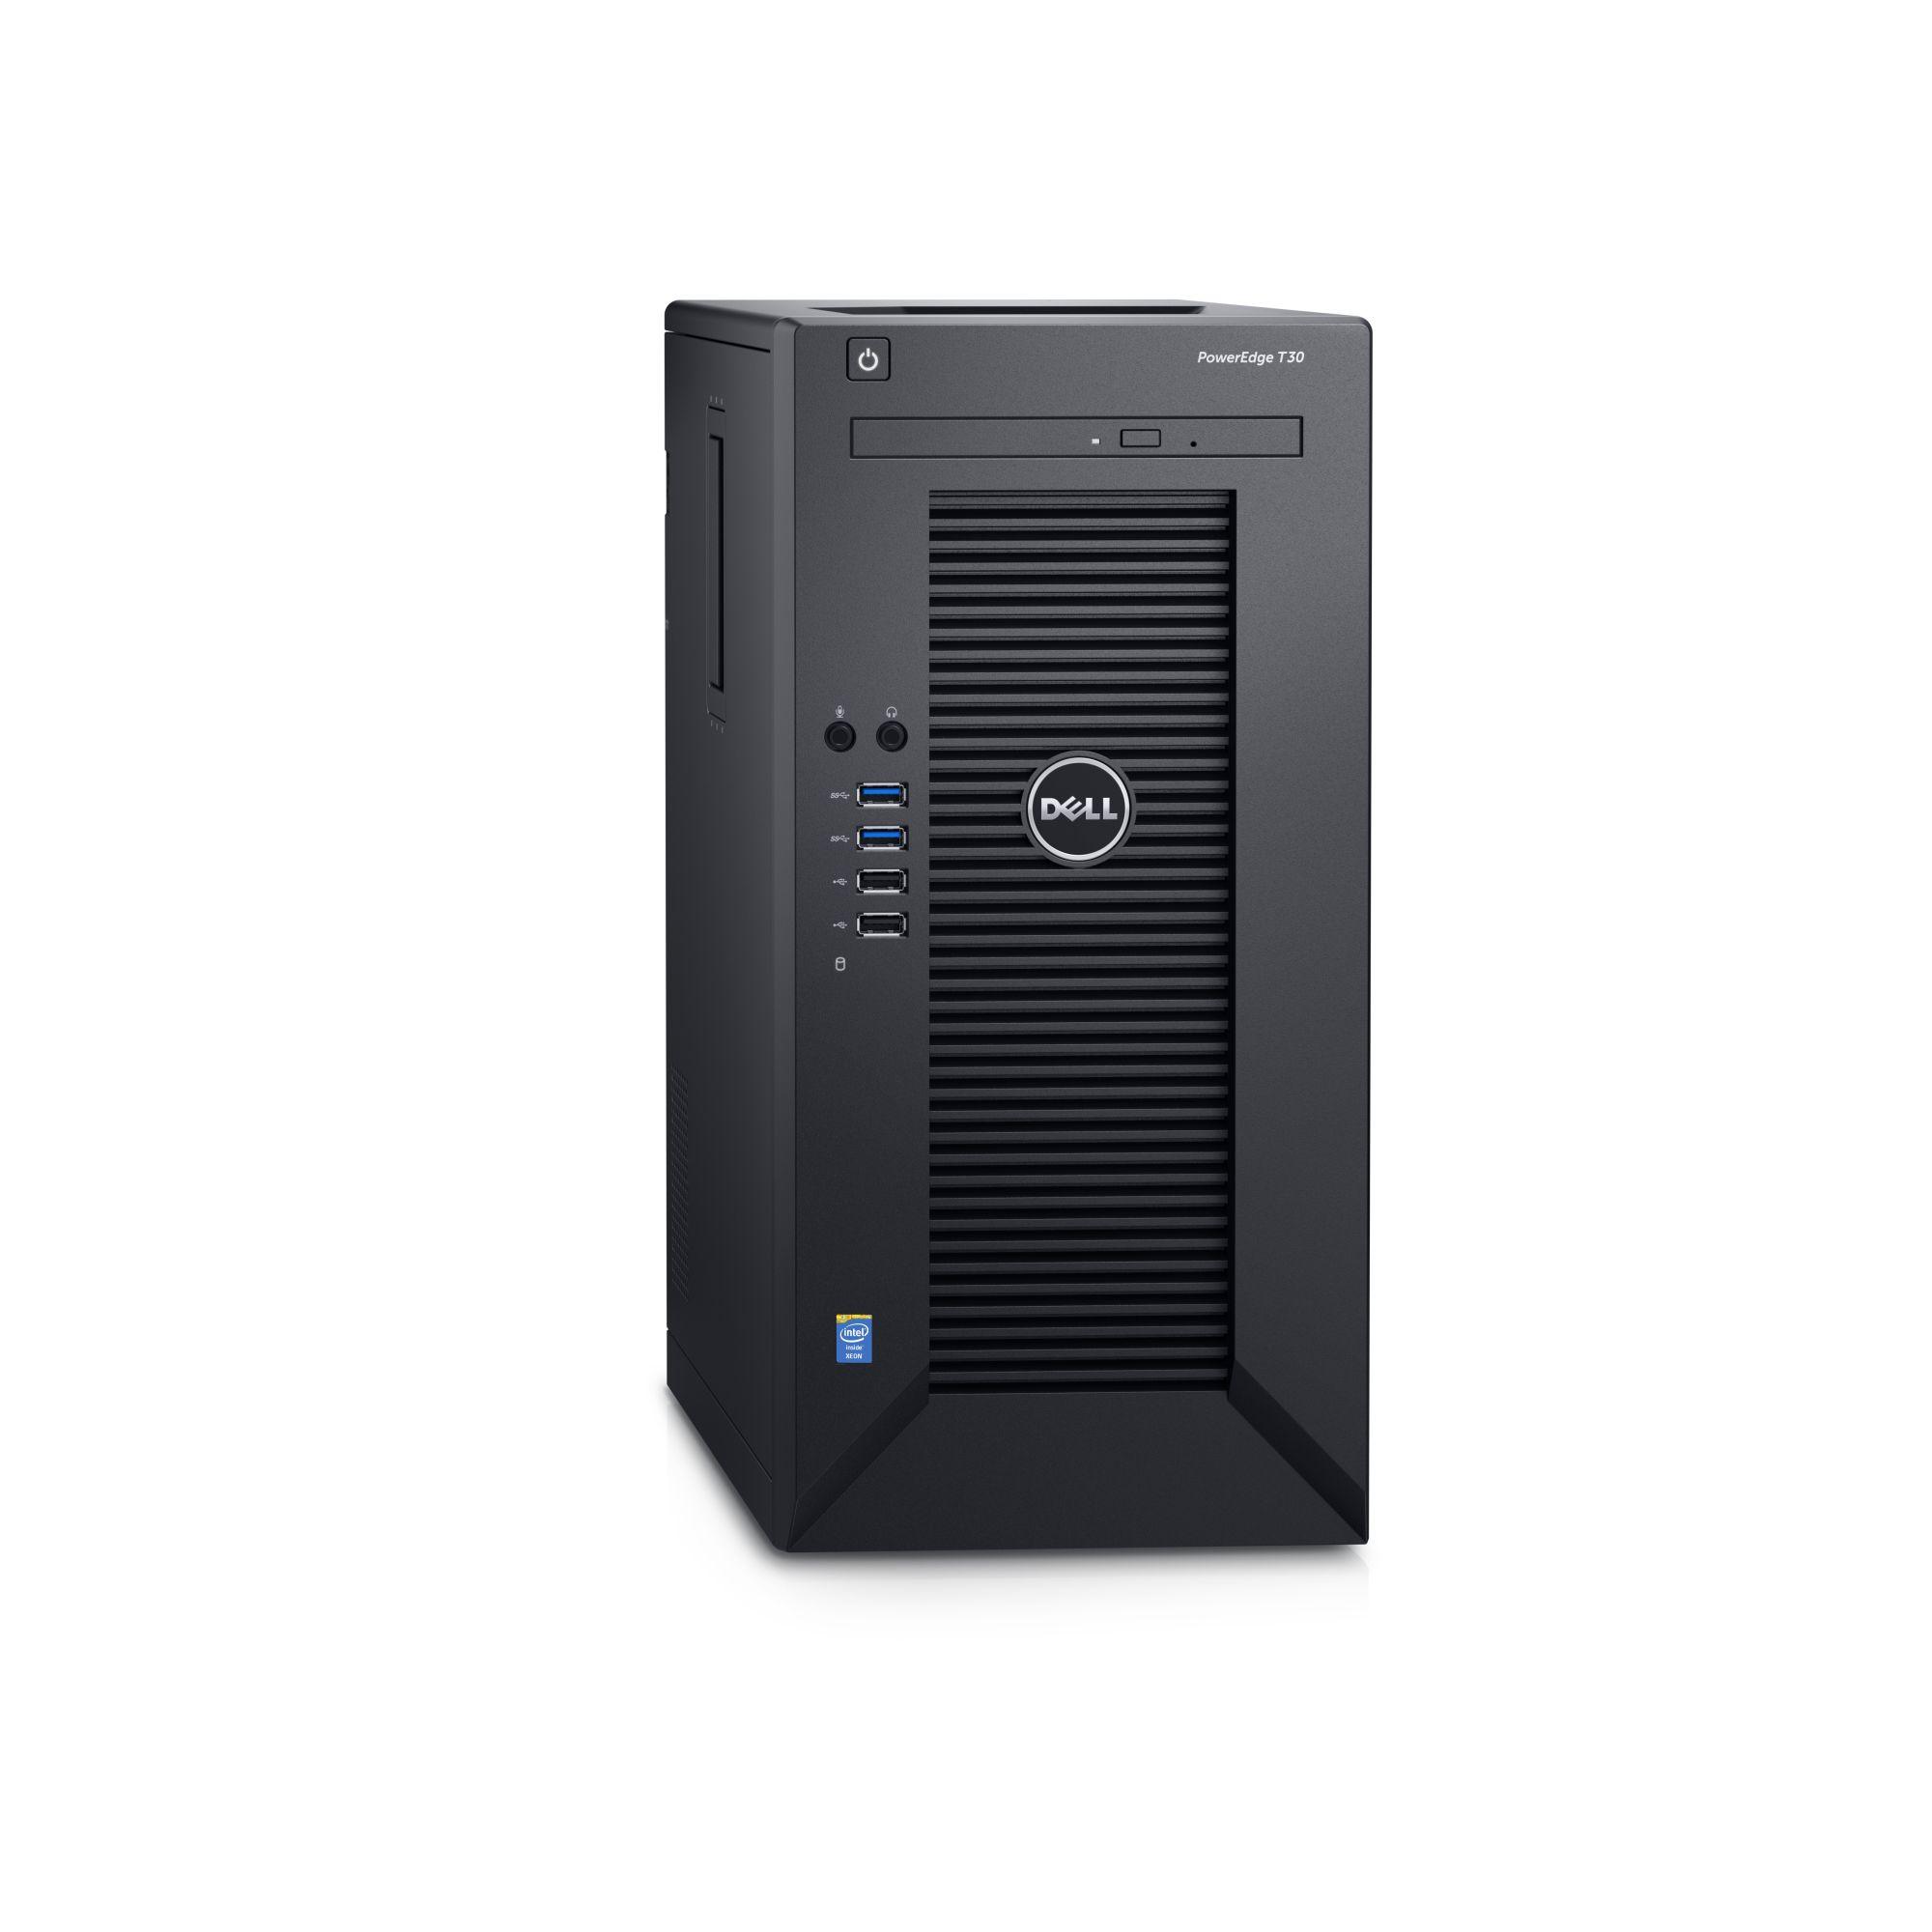 DELL PE T30/E3-1225v5/16GB/2x1TB SATA/DVD/3xGL/1x290W